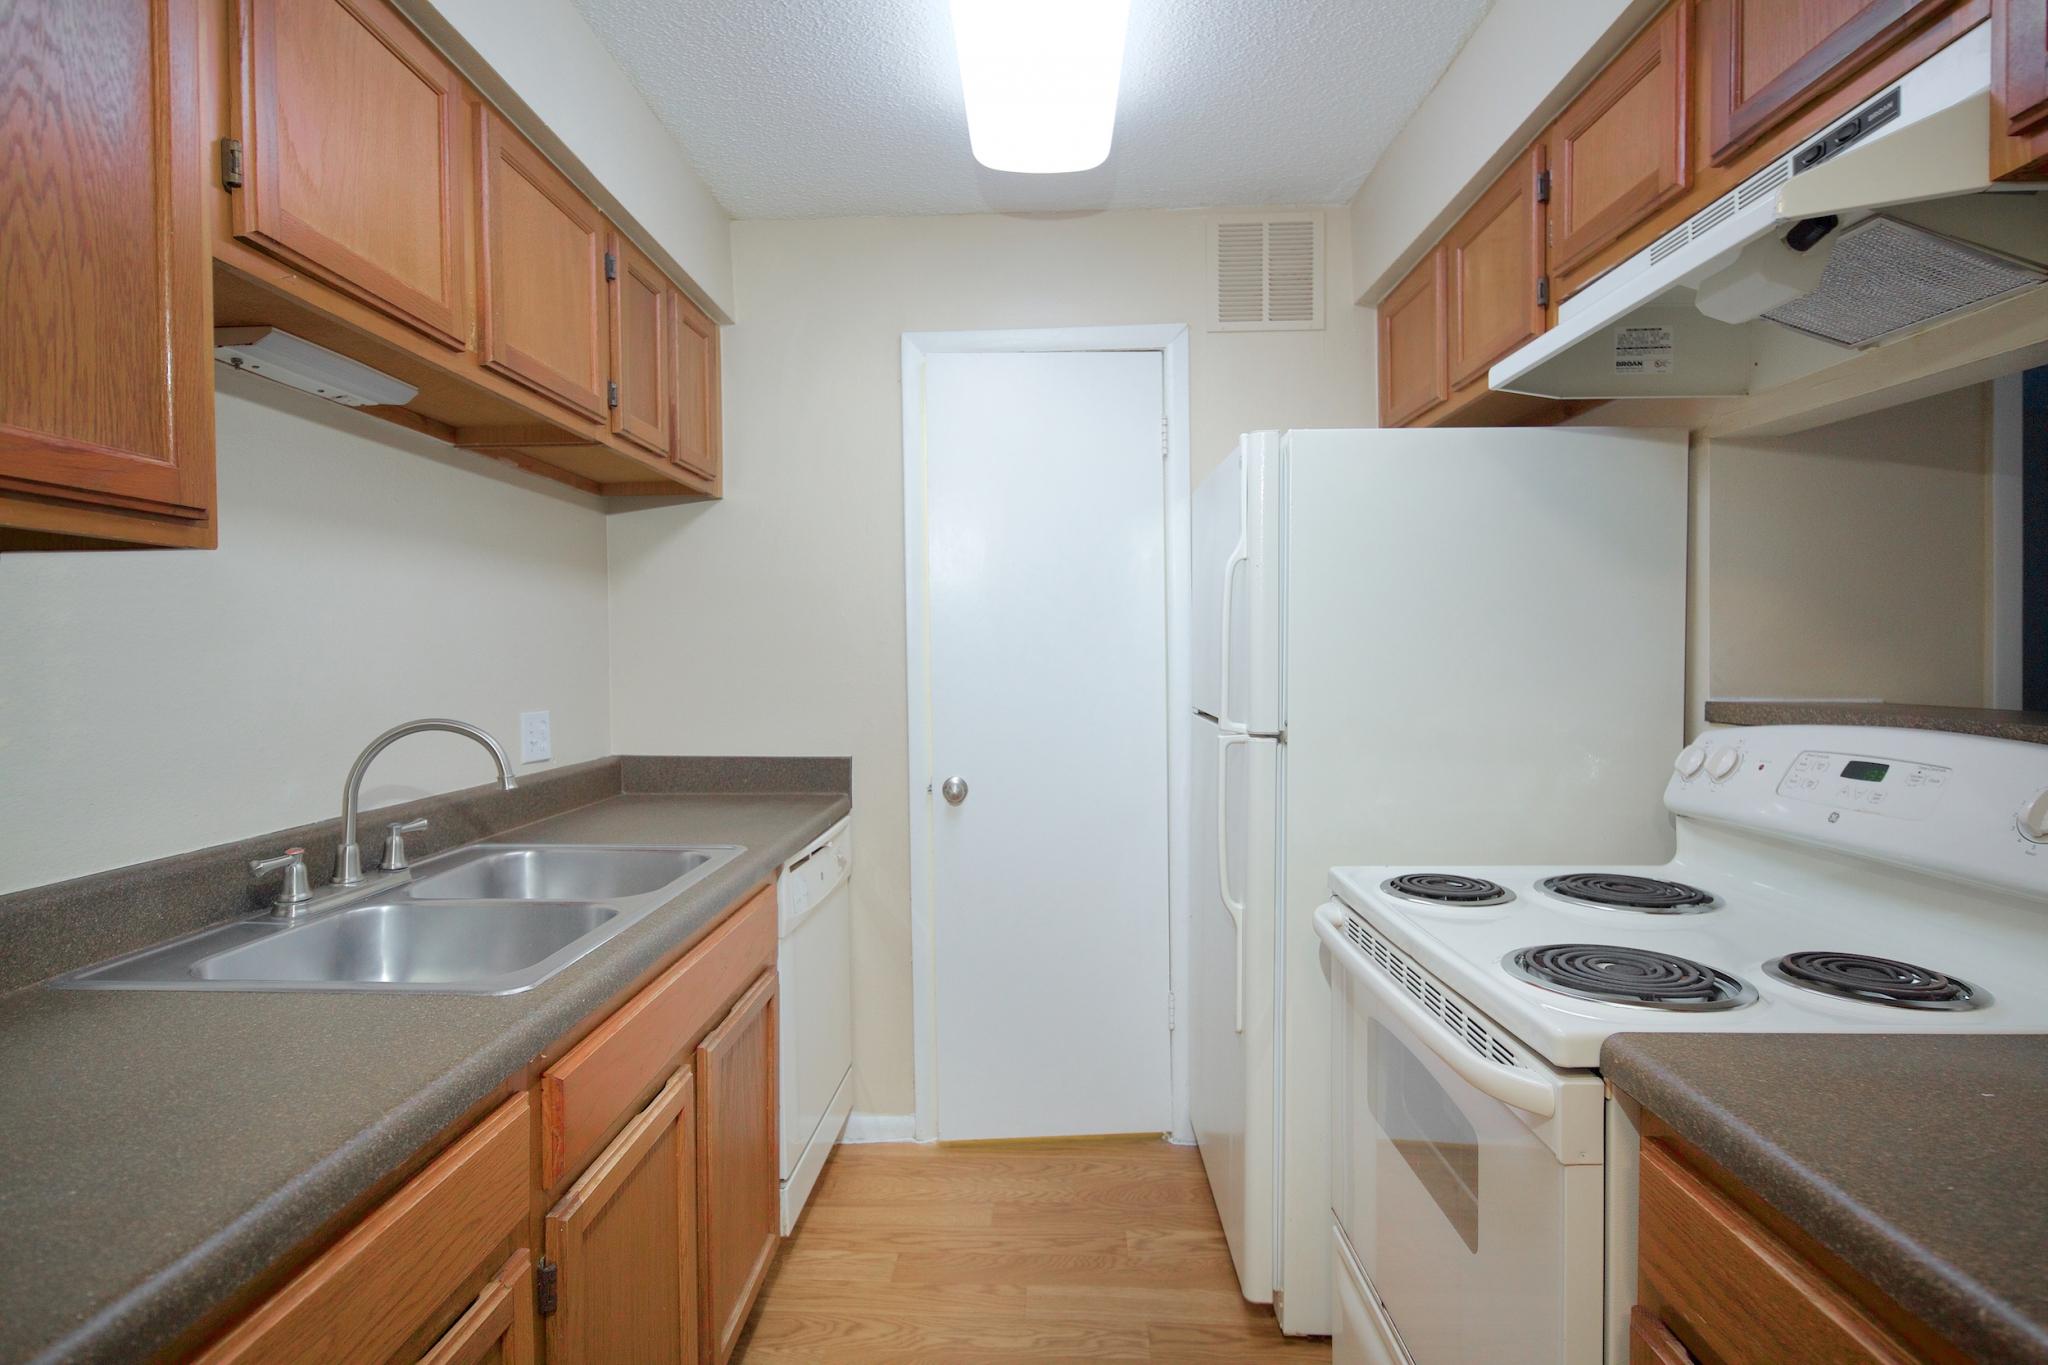 Bentley Green | Jacksonville, Florida Apartment Rentals | Bathroom